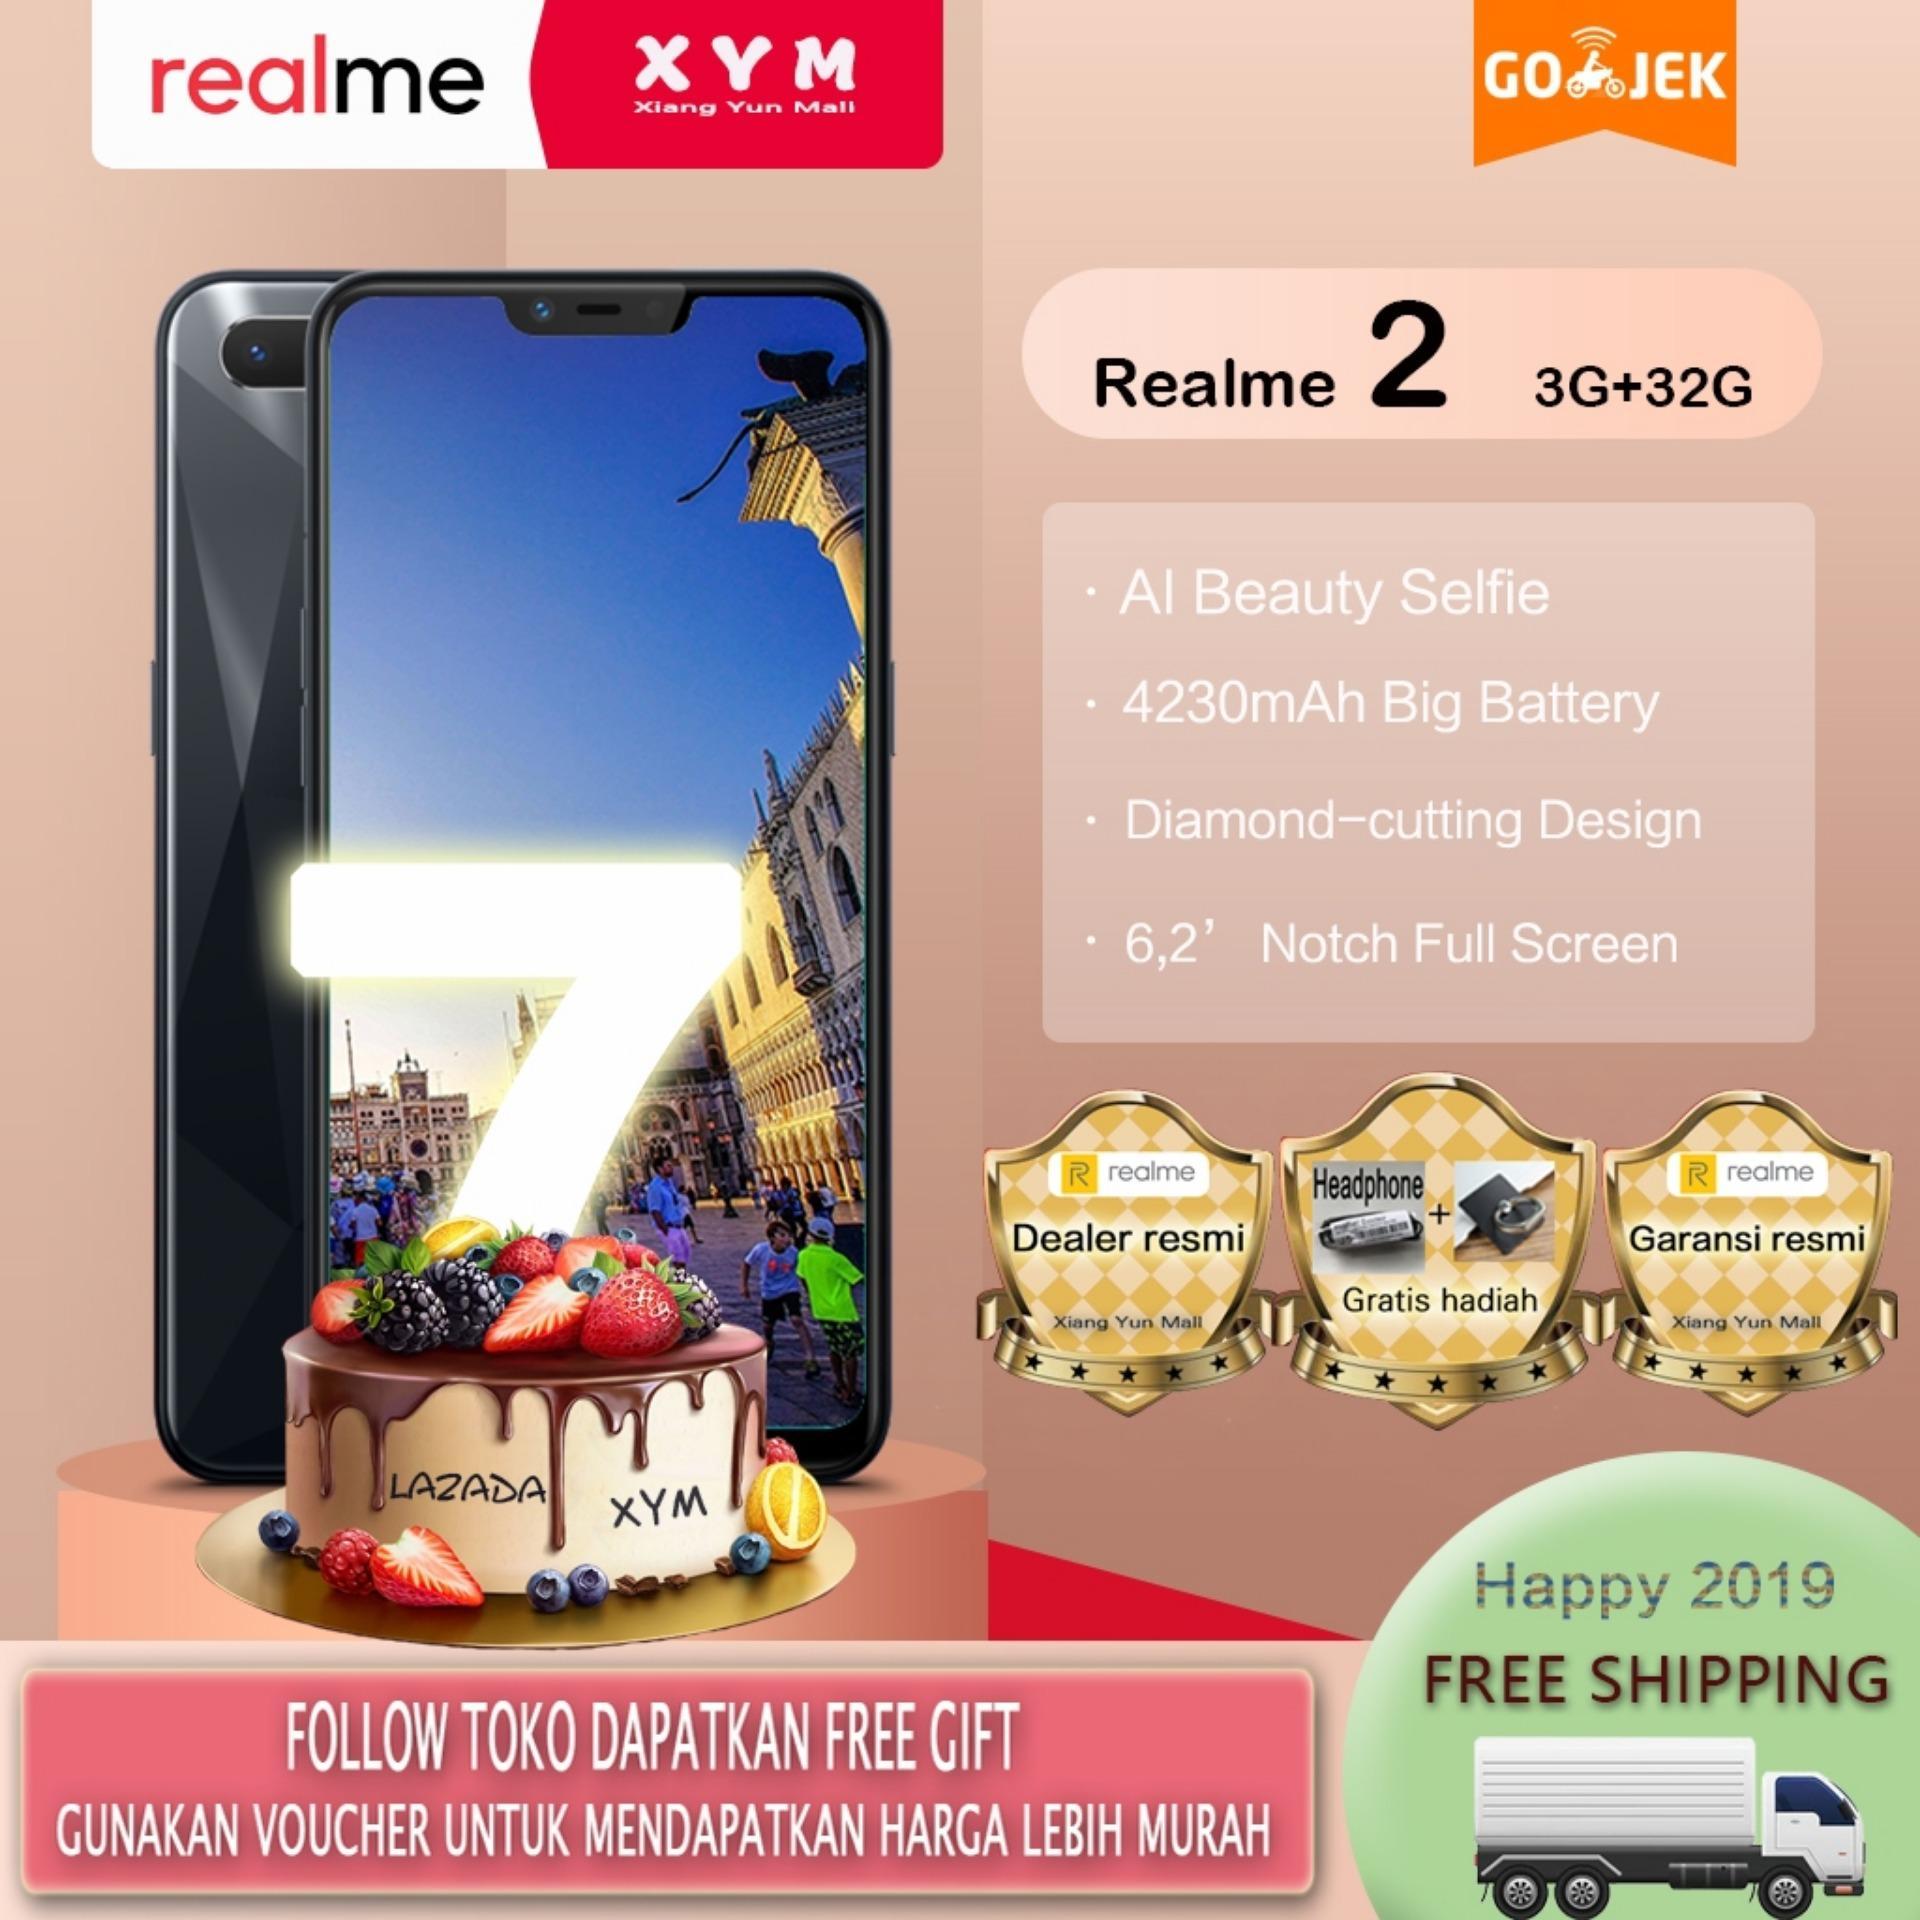 Realme 2 hp 3G/32G - COD, Gratis Ongkir, AI Facial Unlock, Fingerprint Unlock, Garansi resmi [ Please use the voucher ]